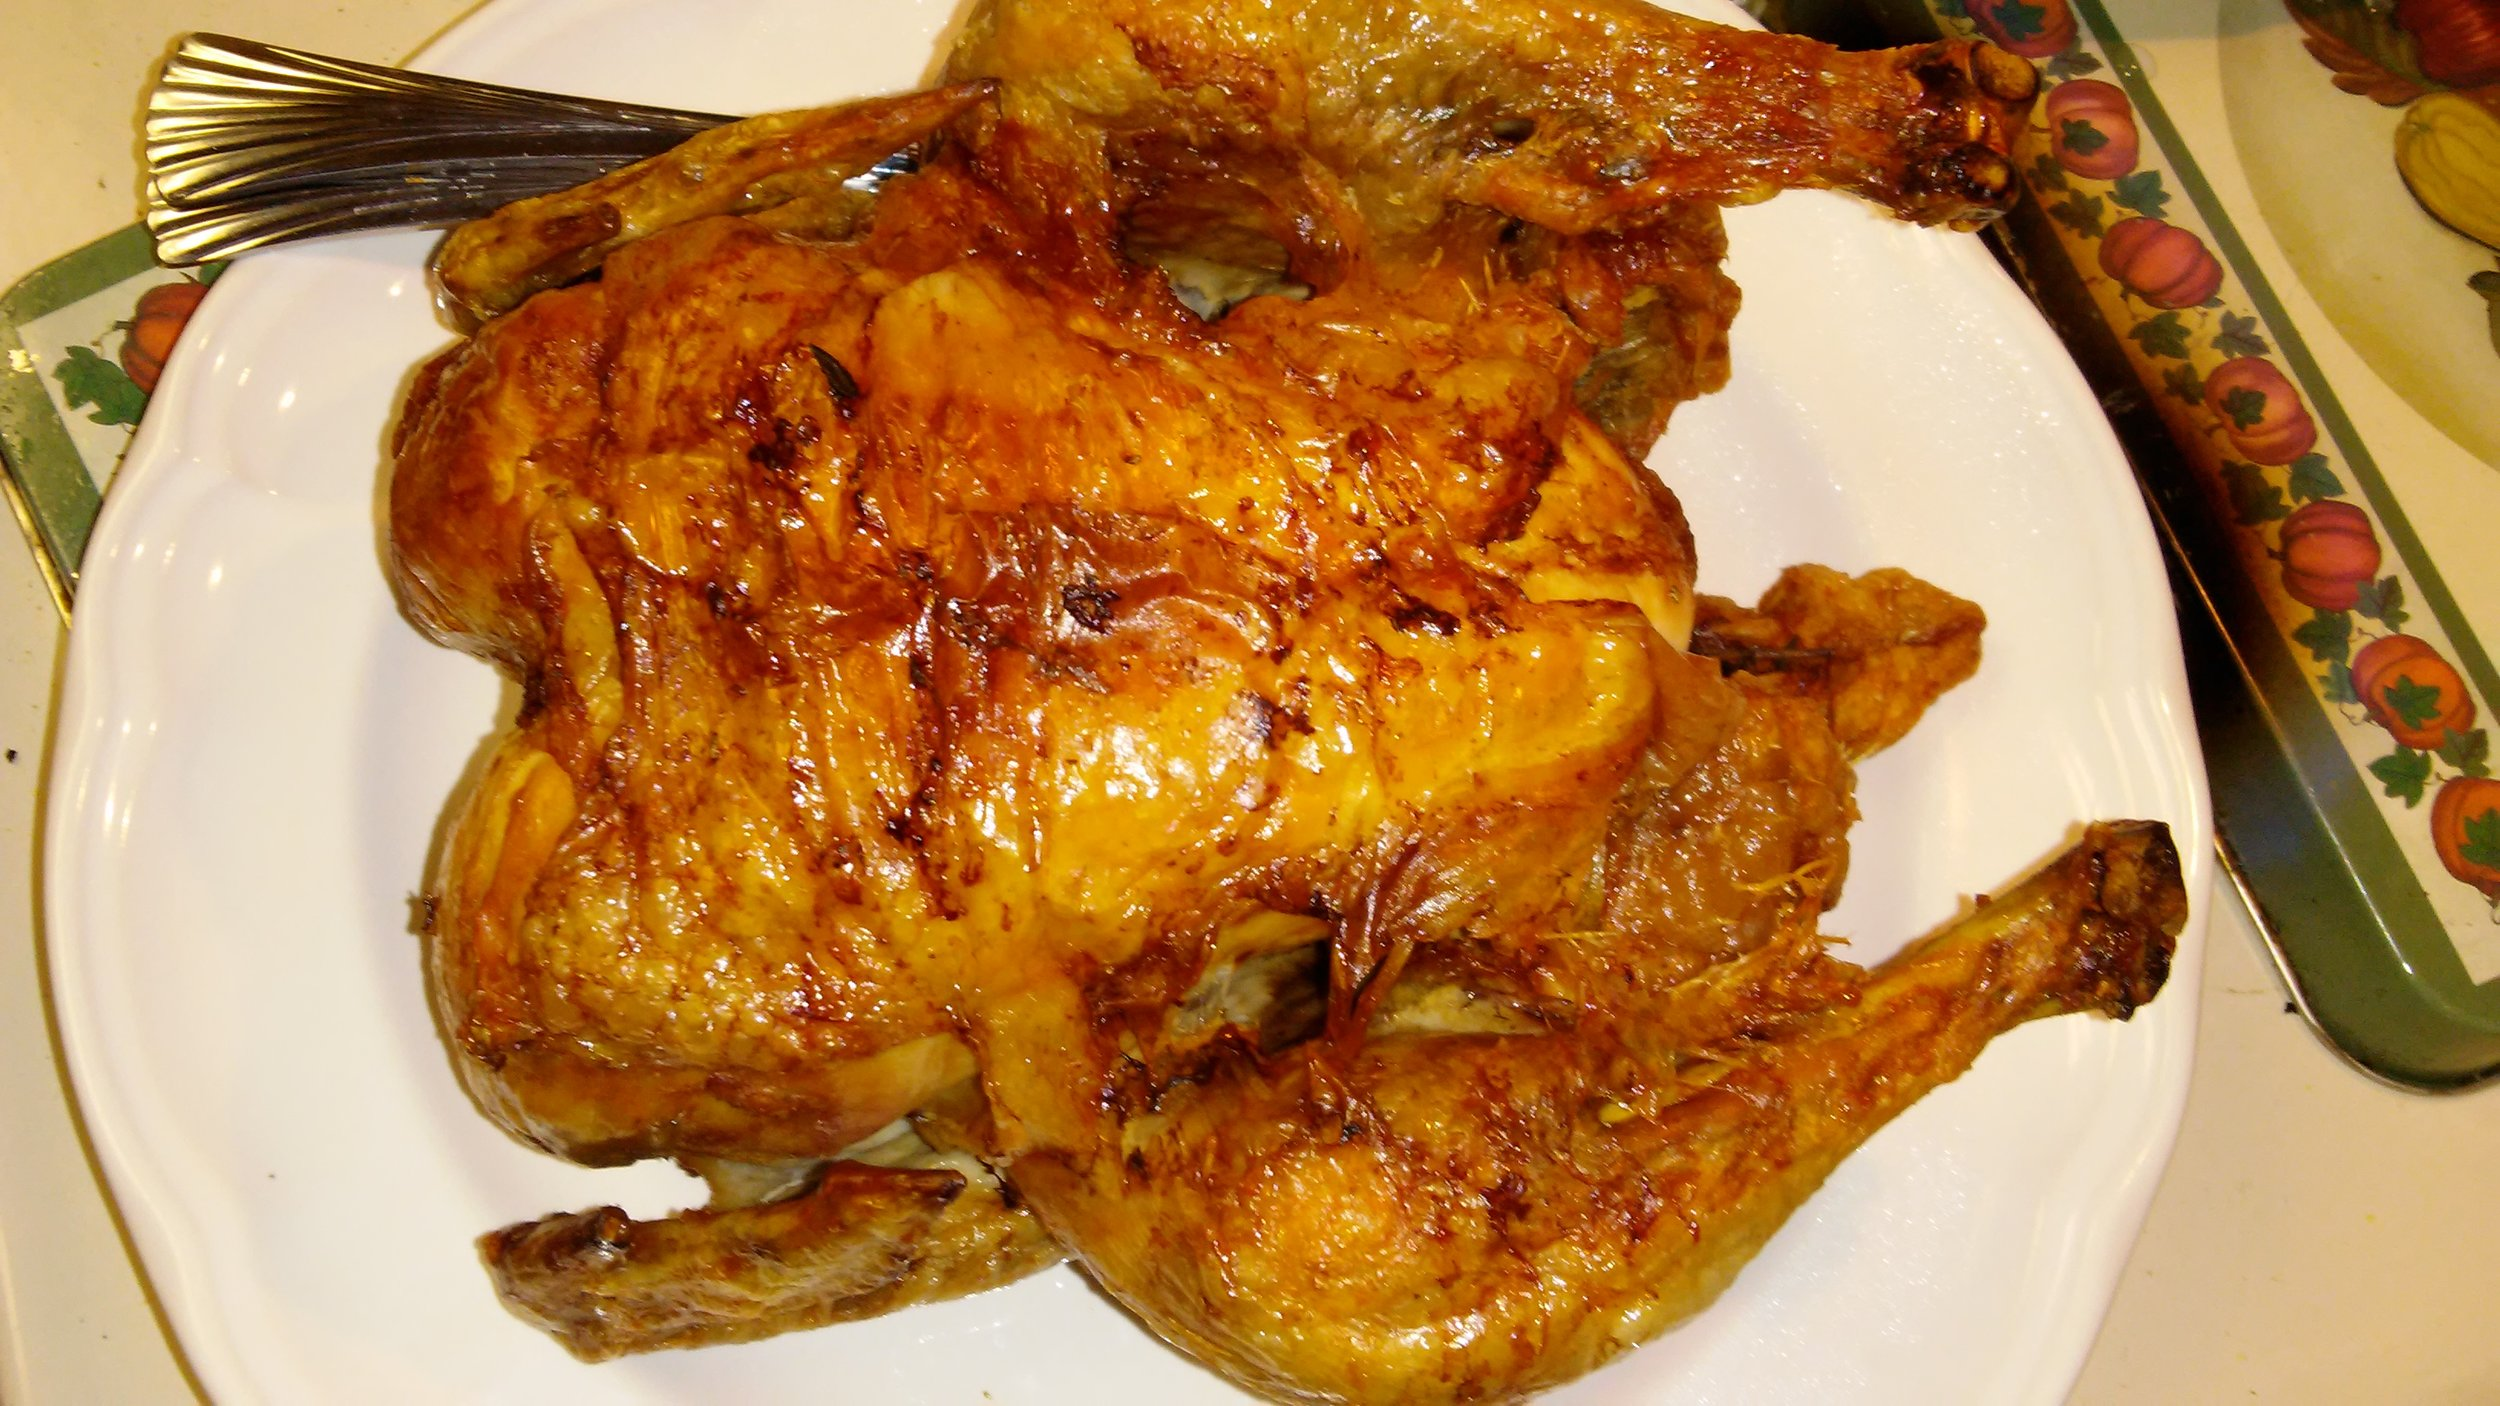 Air-fried organic chicken